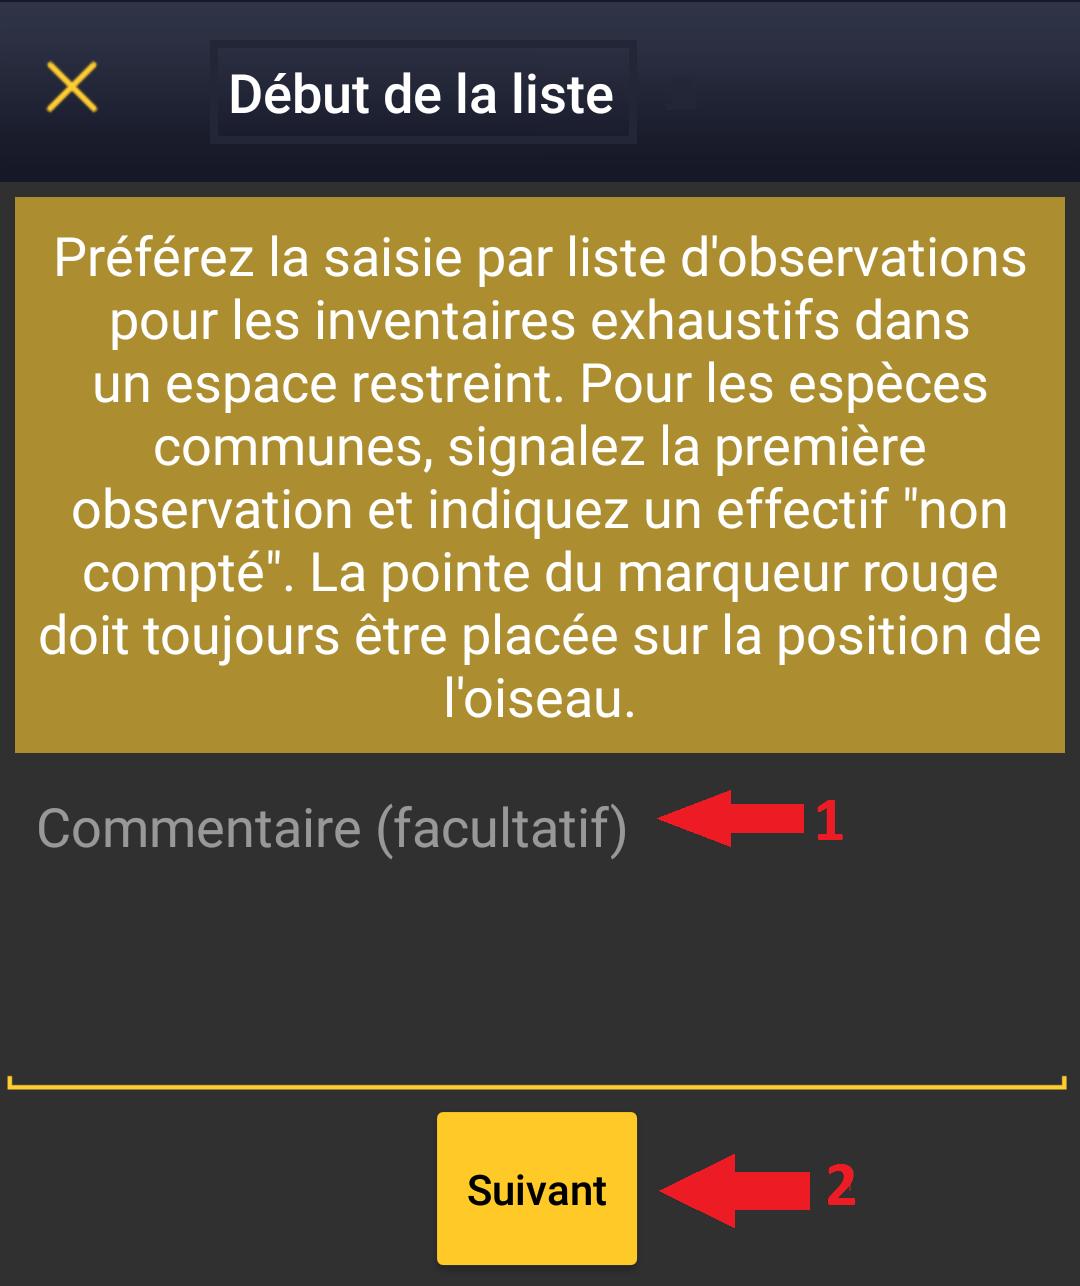 https://cdnfiles2.biolovision.net/www.faune-france.org/userfiles/ListeNaturaList/2-editez-liste.png